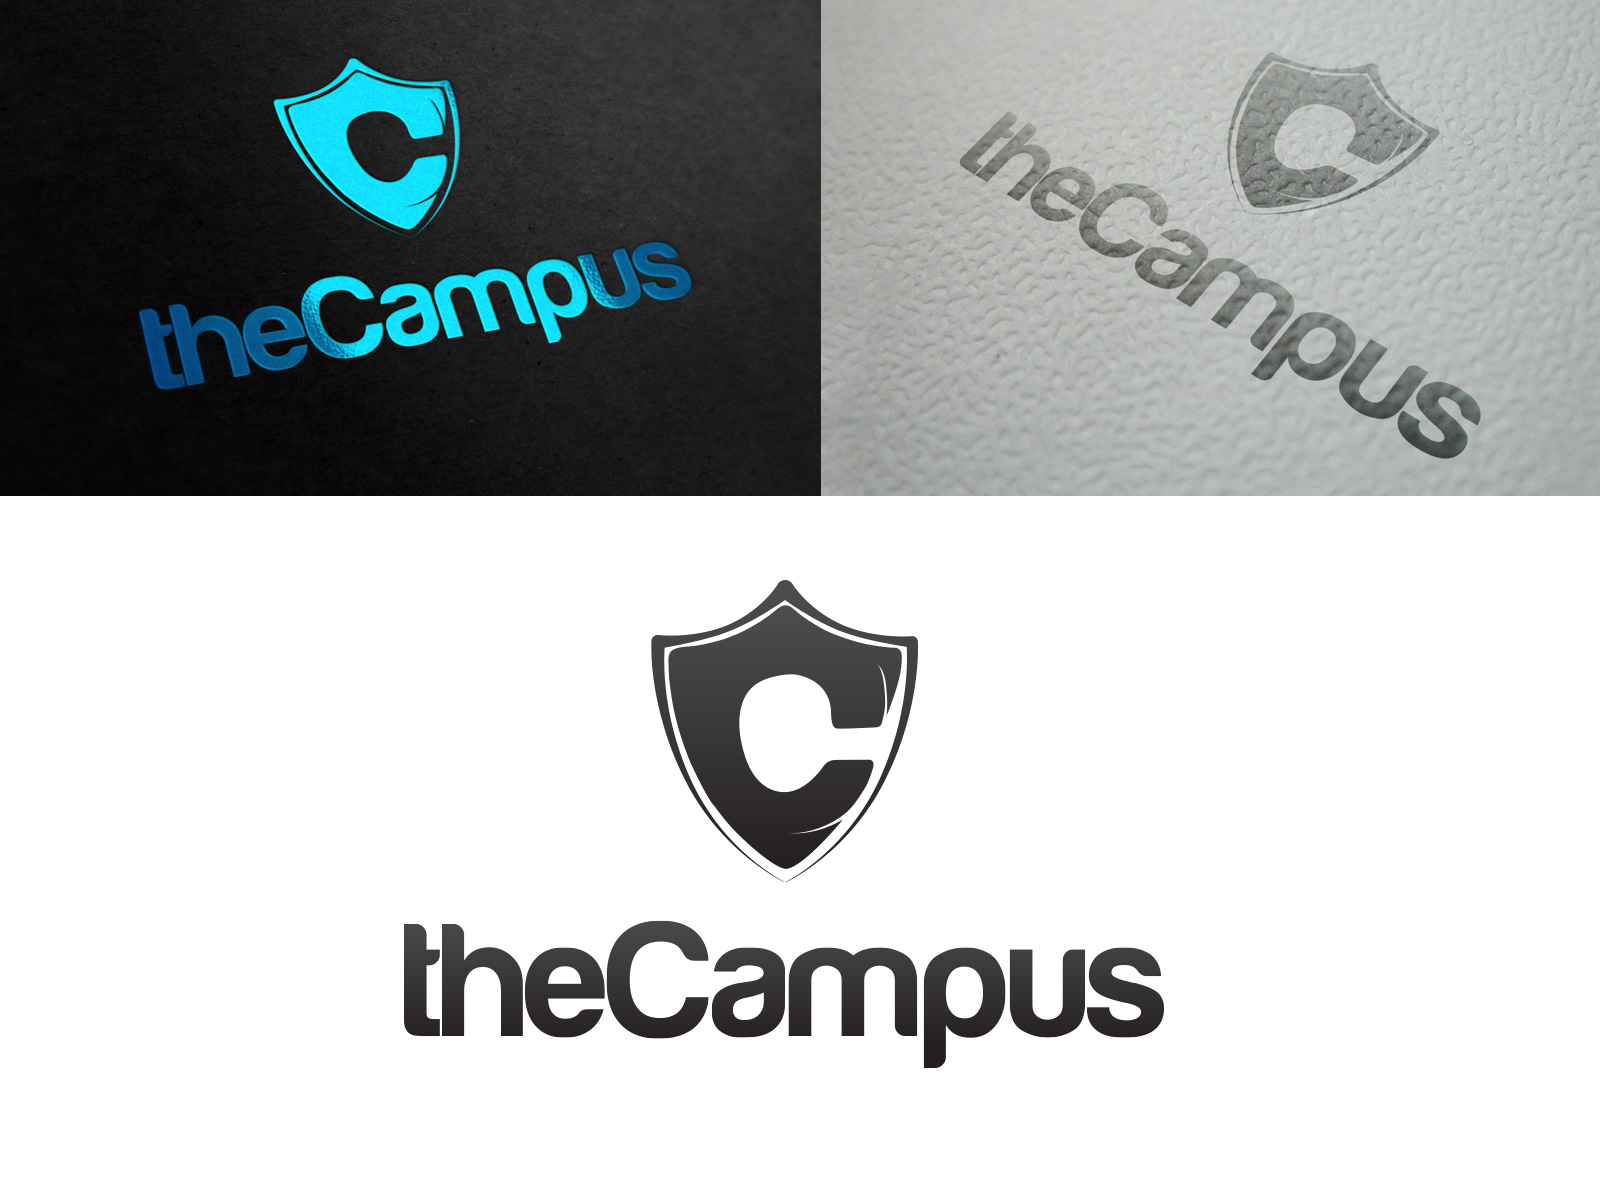 Logo Design by olii - Entry No. 99 in the Logo Design Contest theCampus Logo Design.